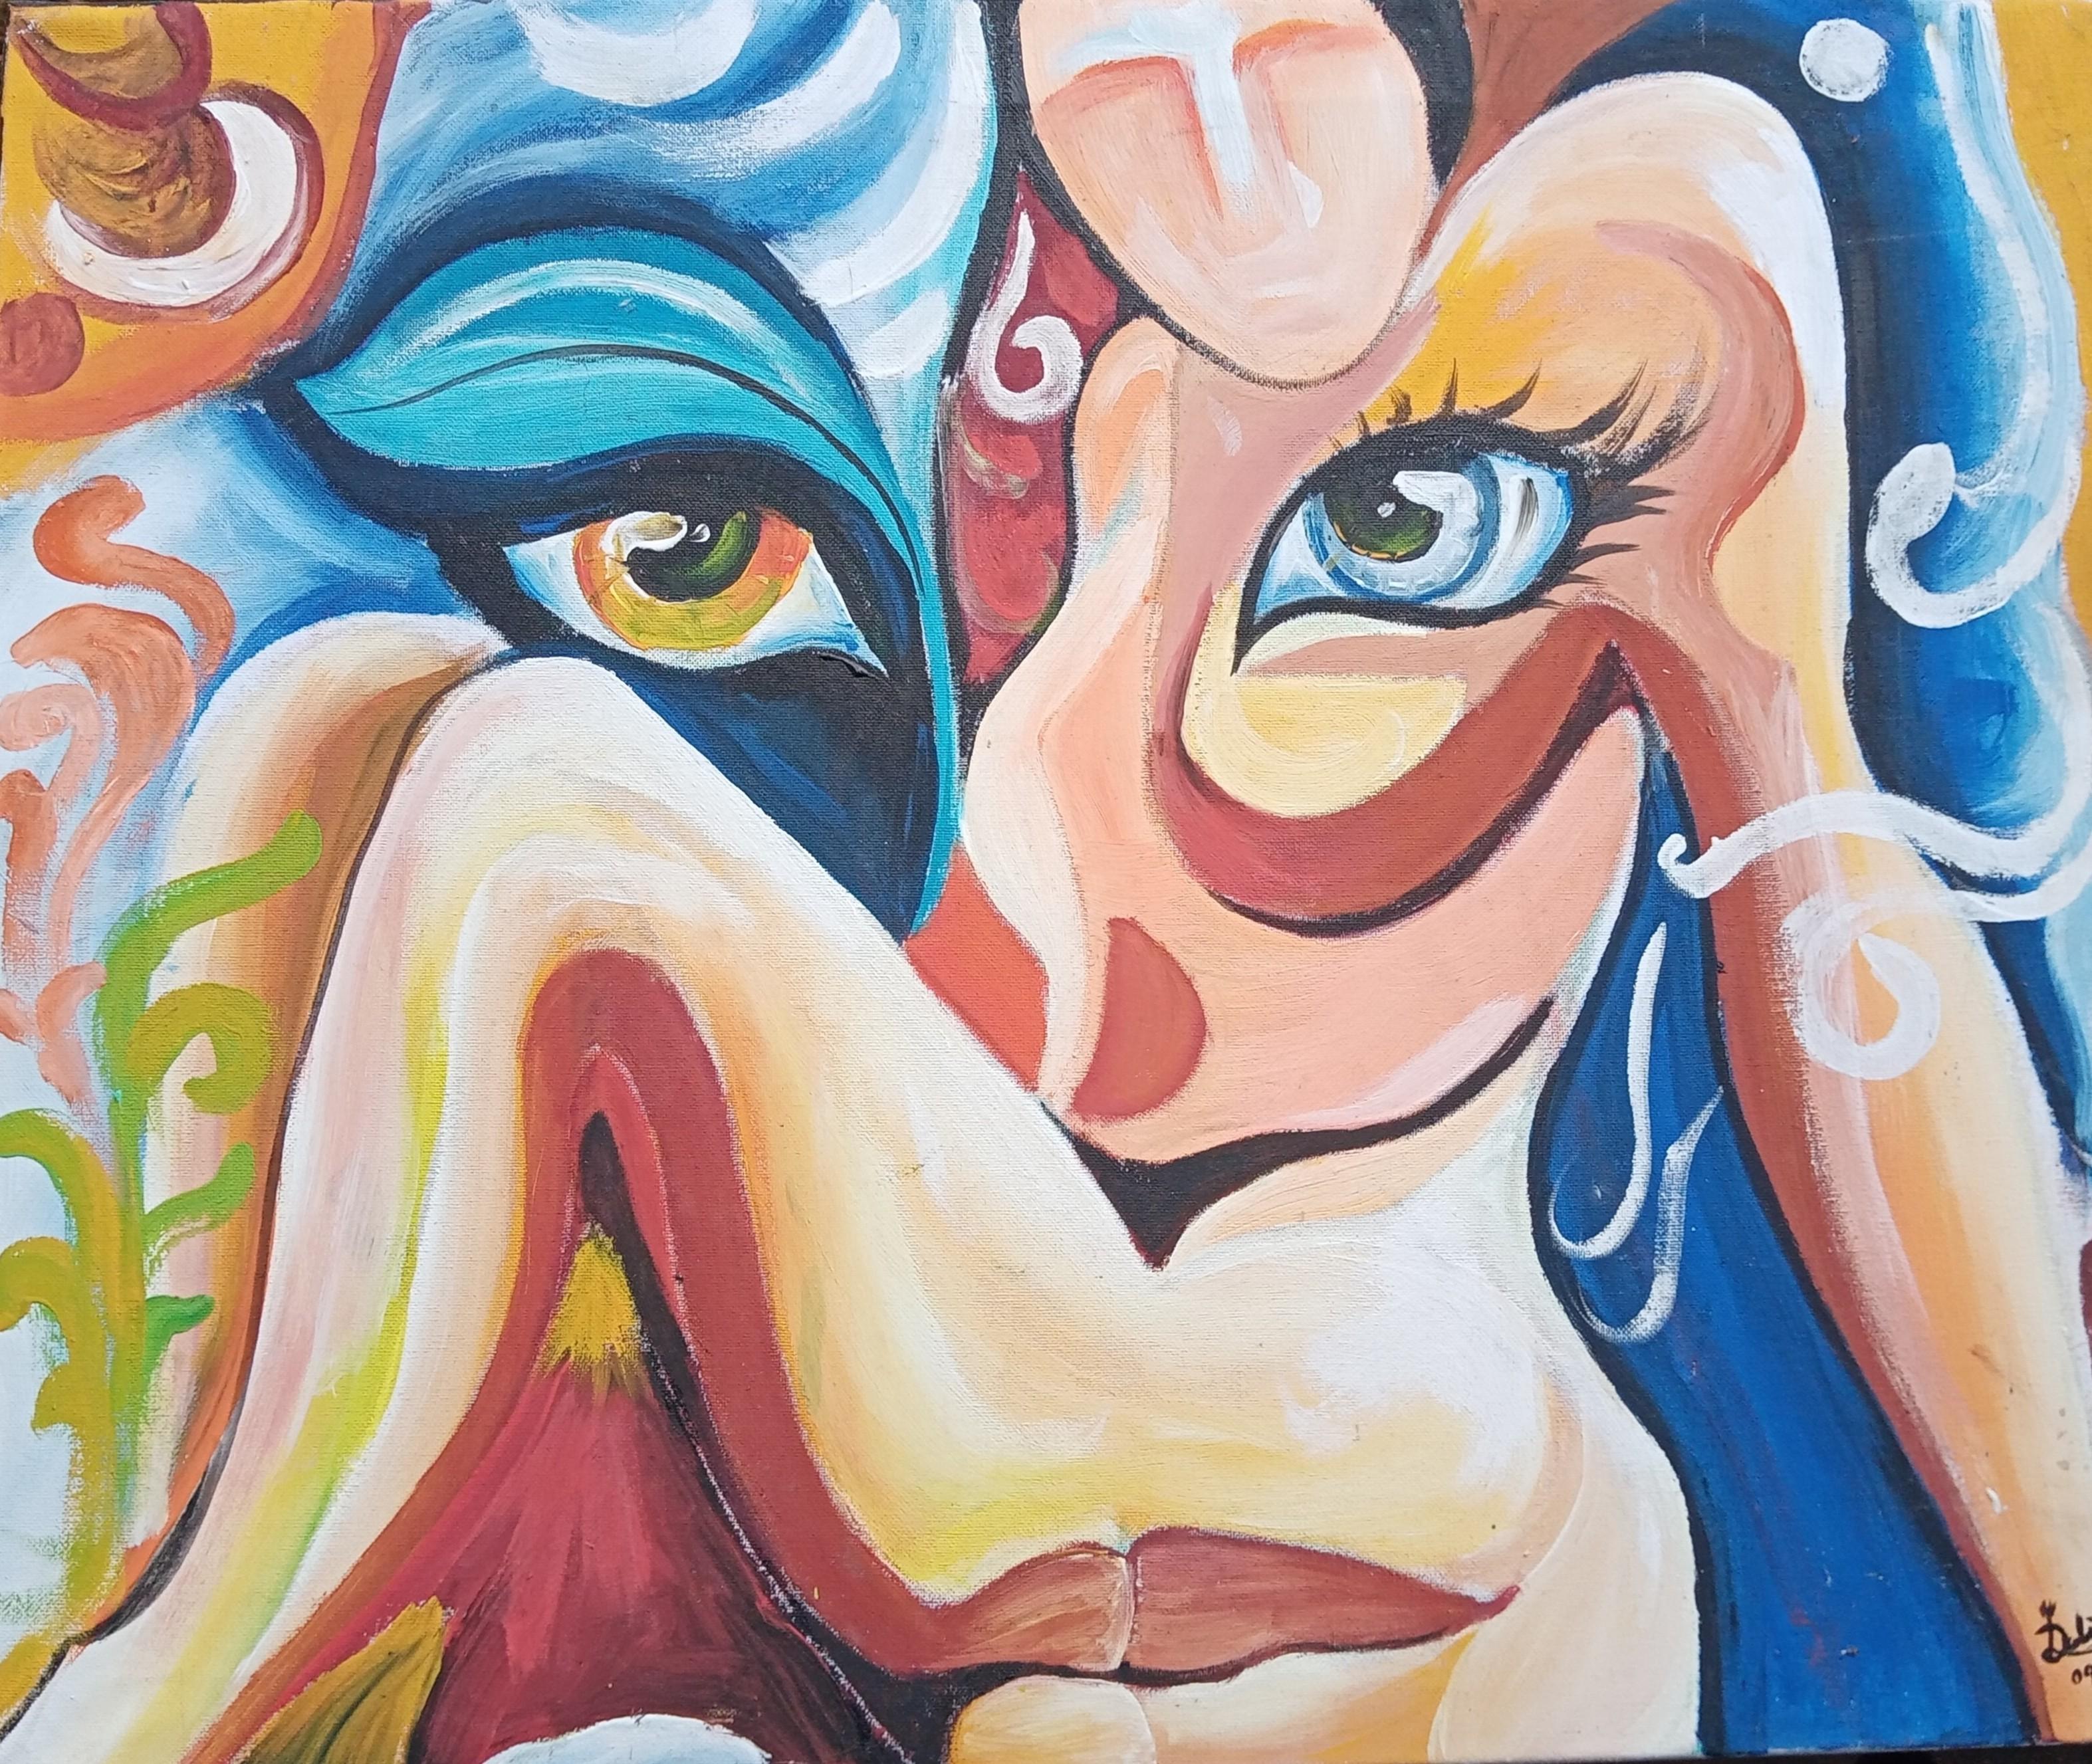 Untitled by Arthana Pushpalingam